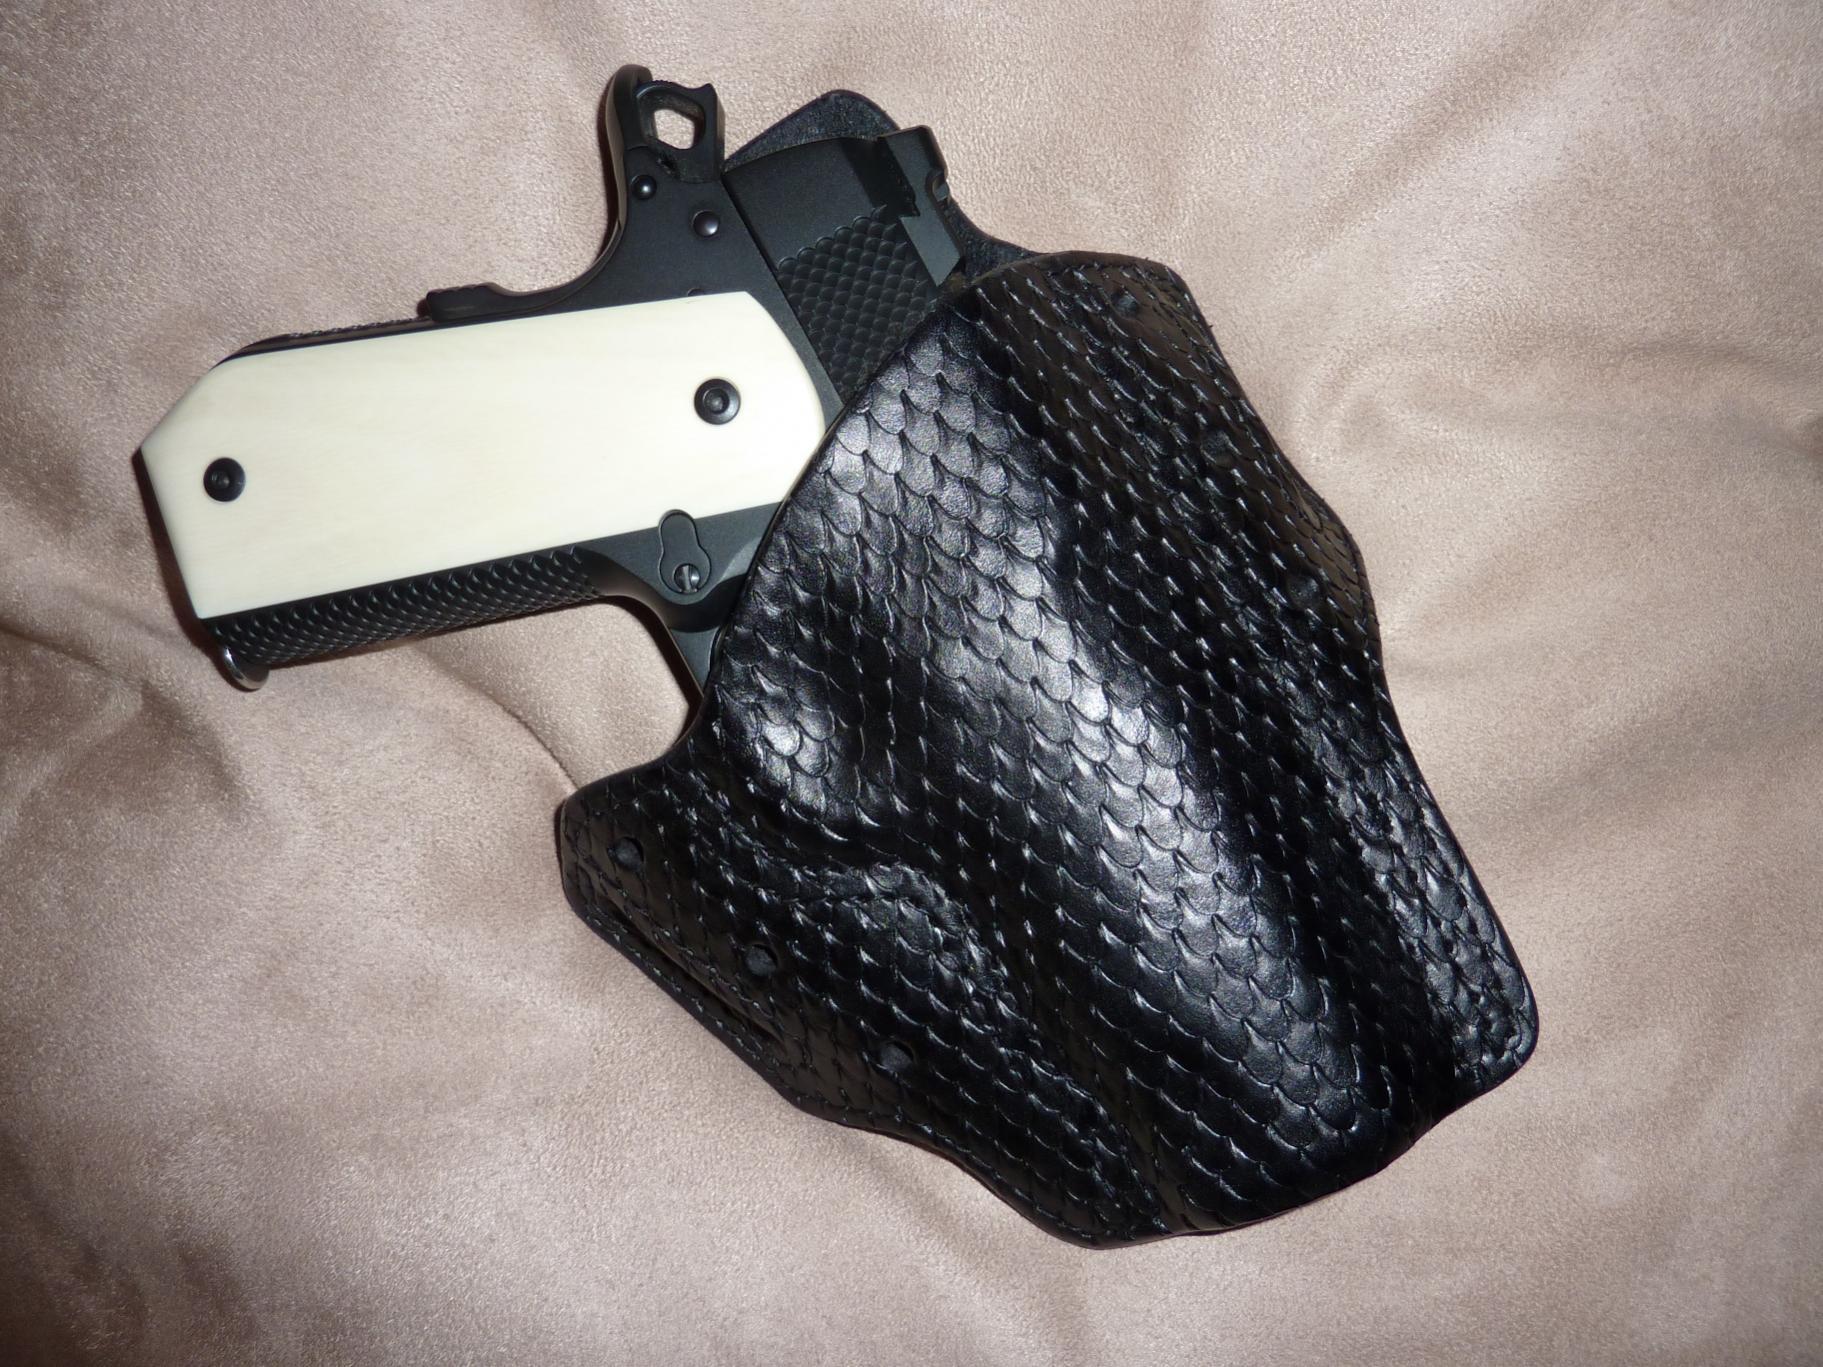 looking for snakeskin holster for Glock 19 (preferrably in black)-kclw.jpg